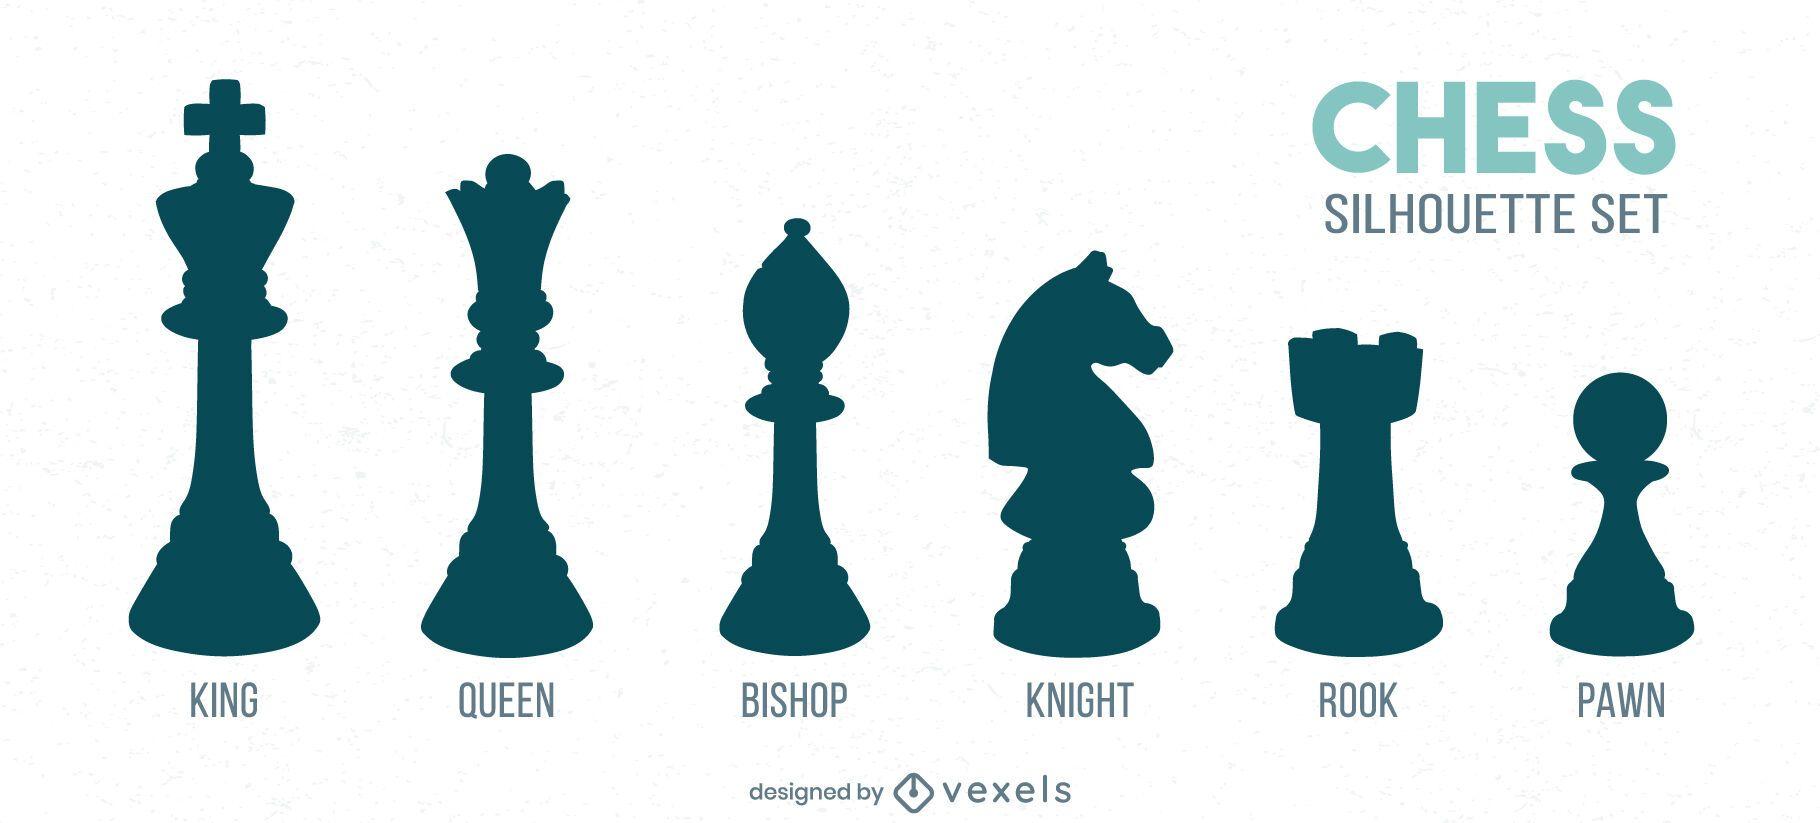 Conjunto de siluetas detalladas de piezas de ajedrez